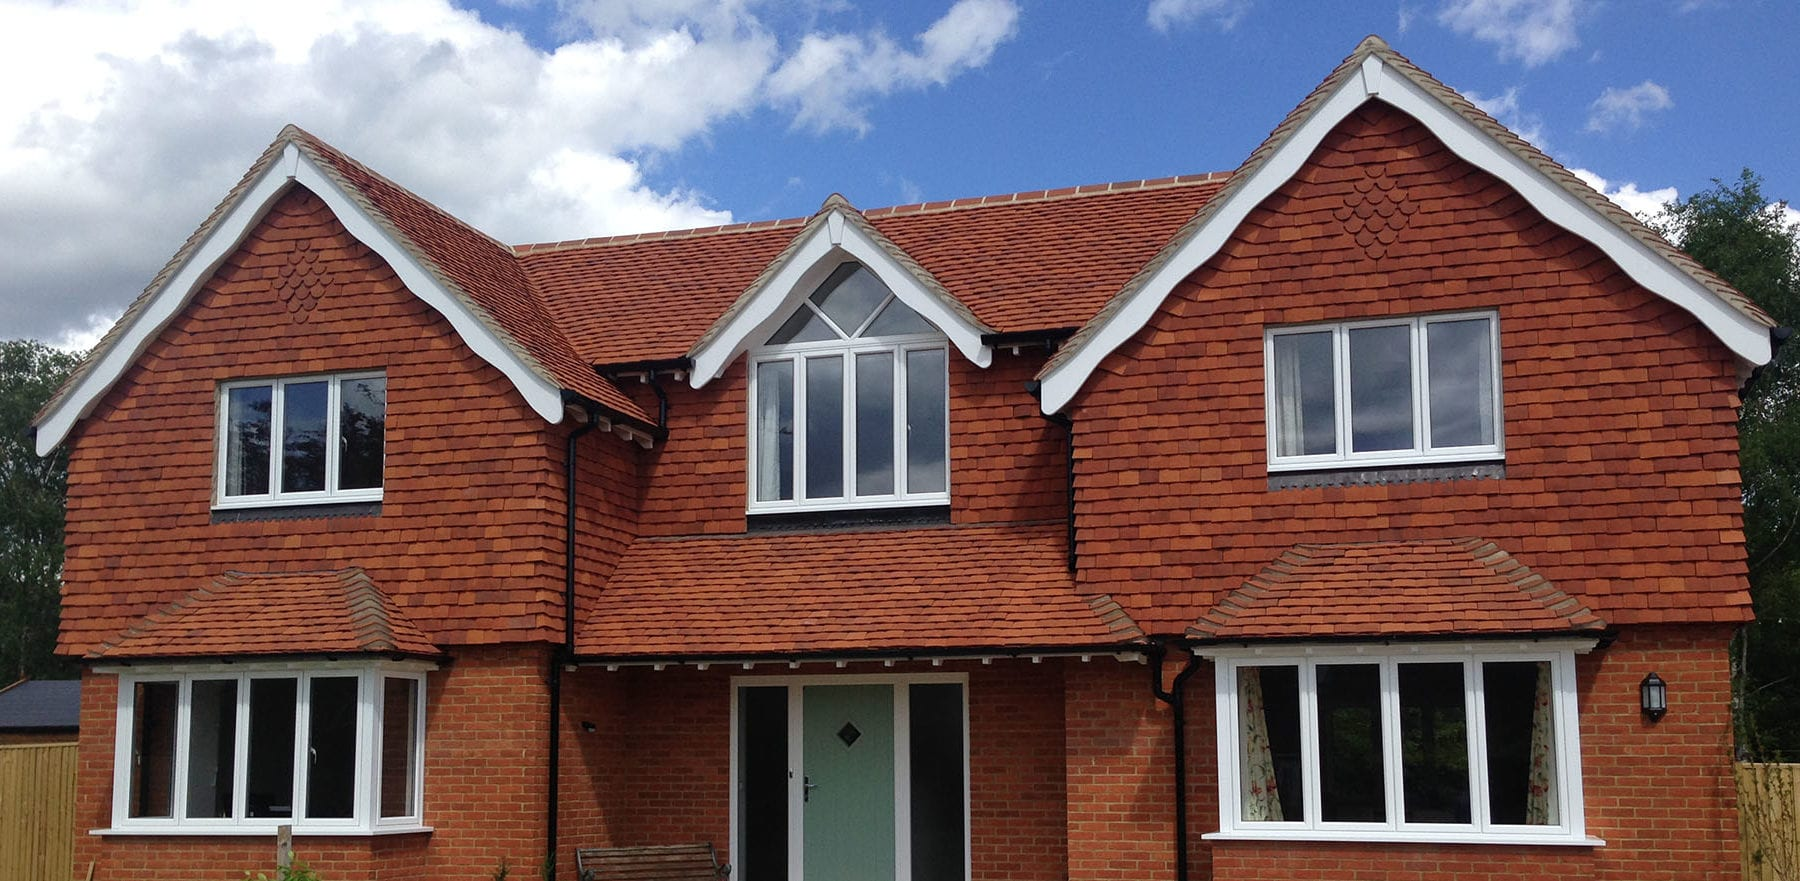 Lifestiles - Handmade Orange Clay Roof Tiles - Bookham, England 2